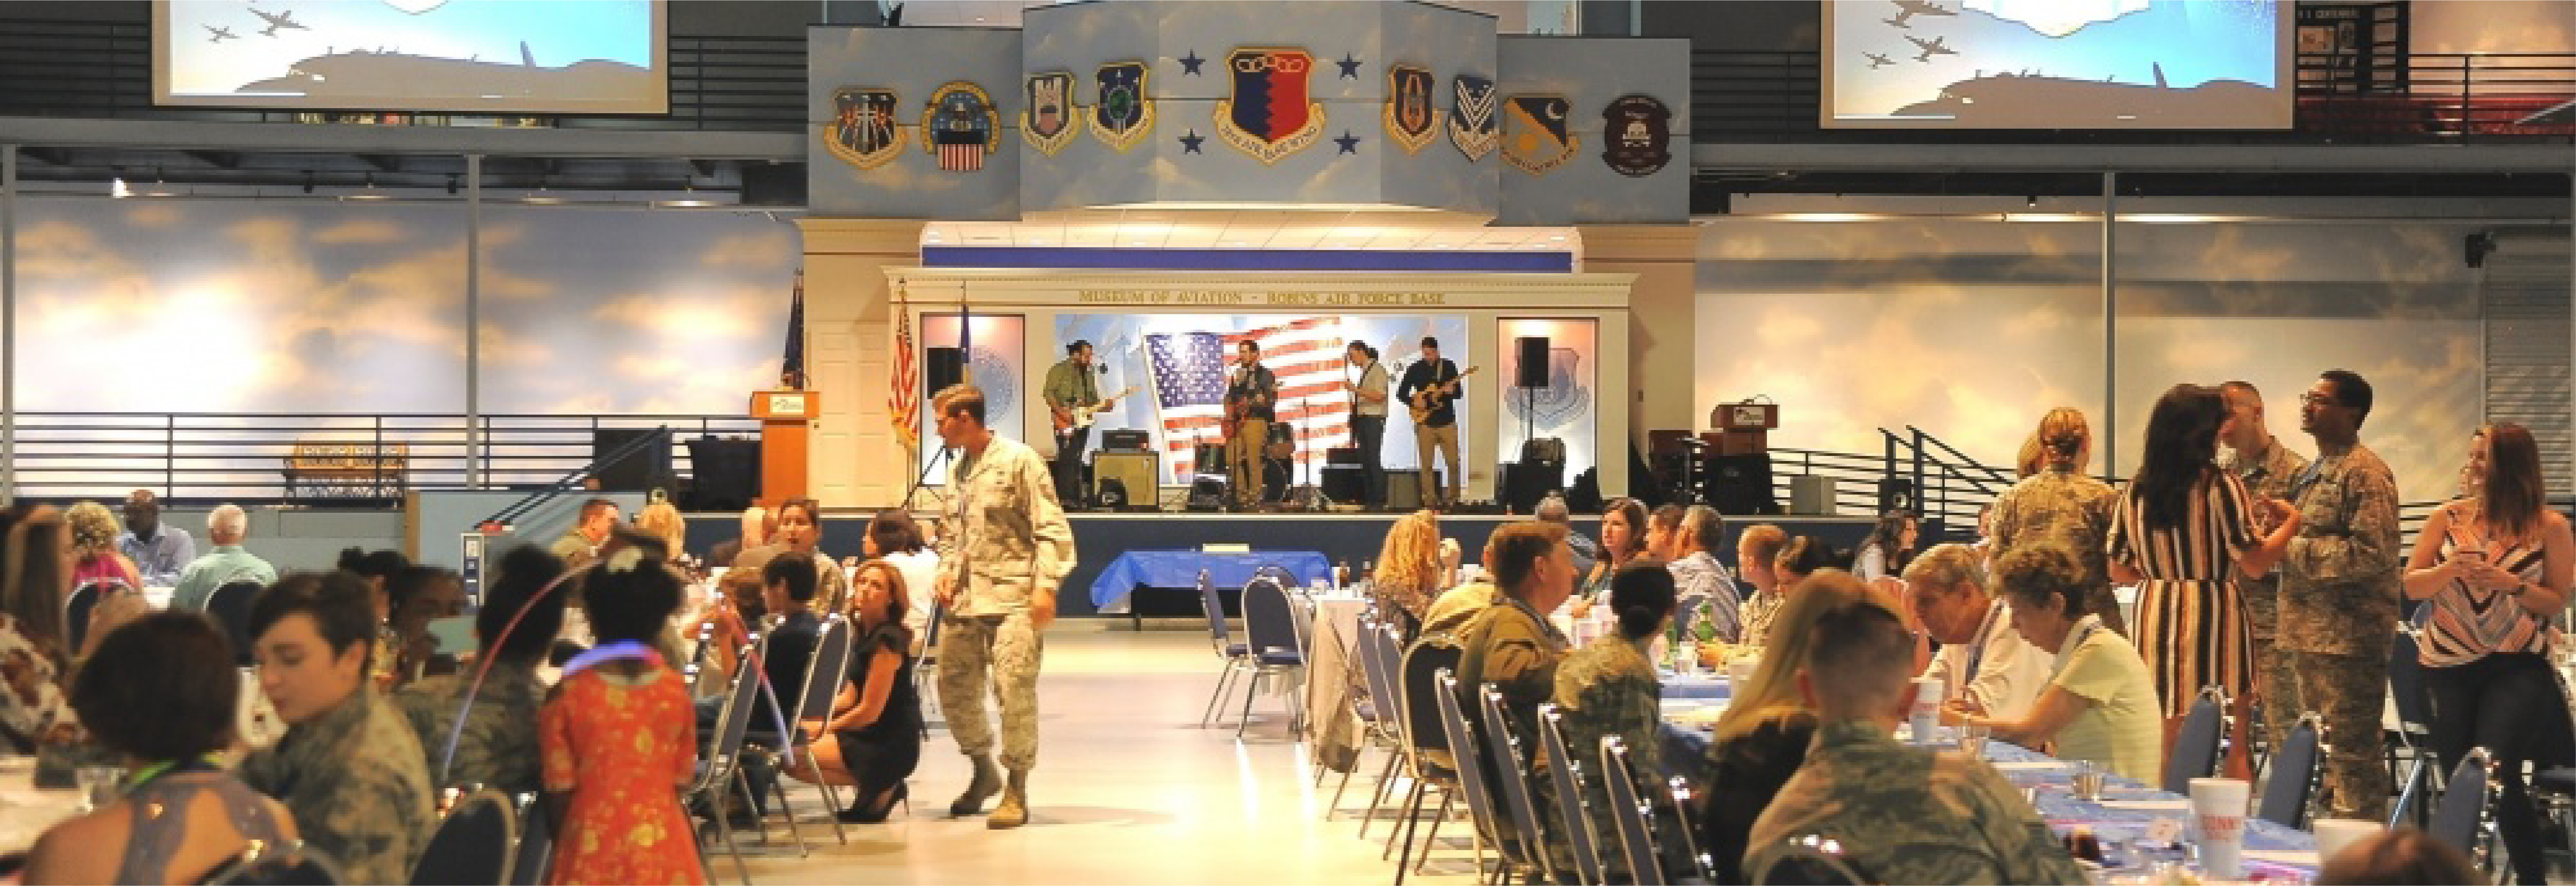 Air Force Birthday: Celebrating Those Who Aim High